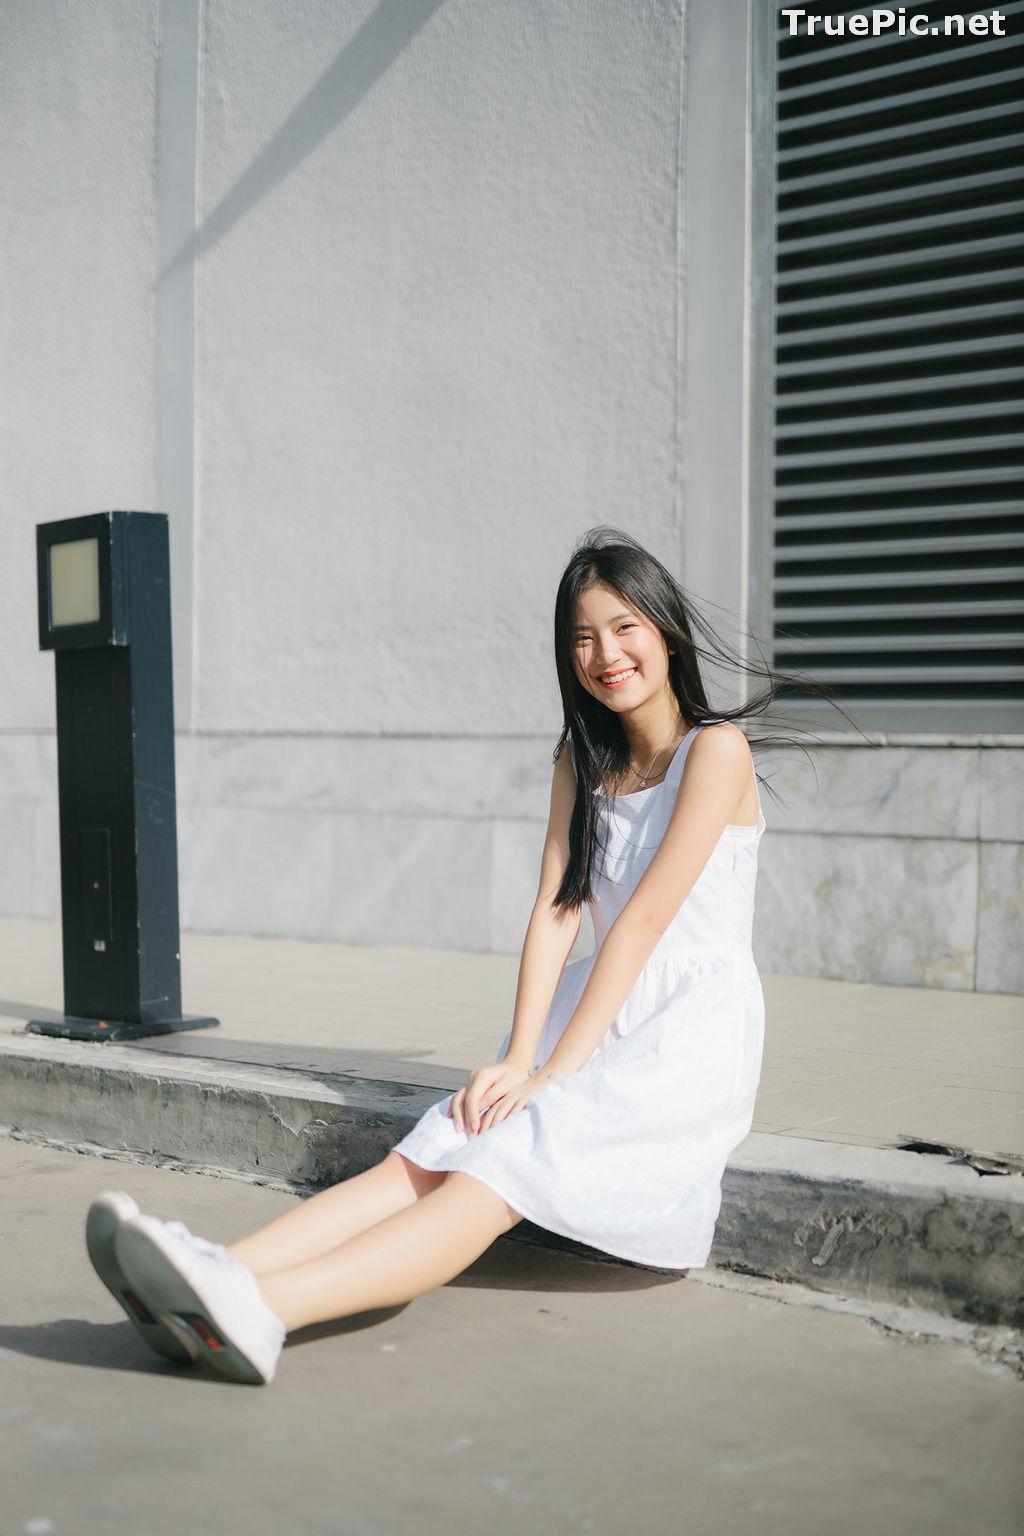 Image Thailand Model - Venita Loywattanakul - A Beautiful White - TruePic.net - Picture-8